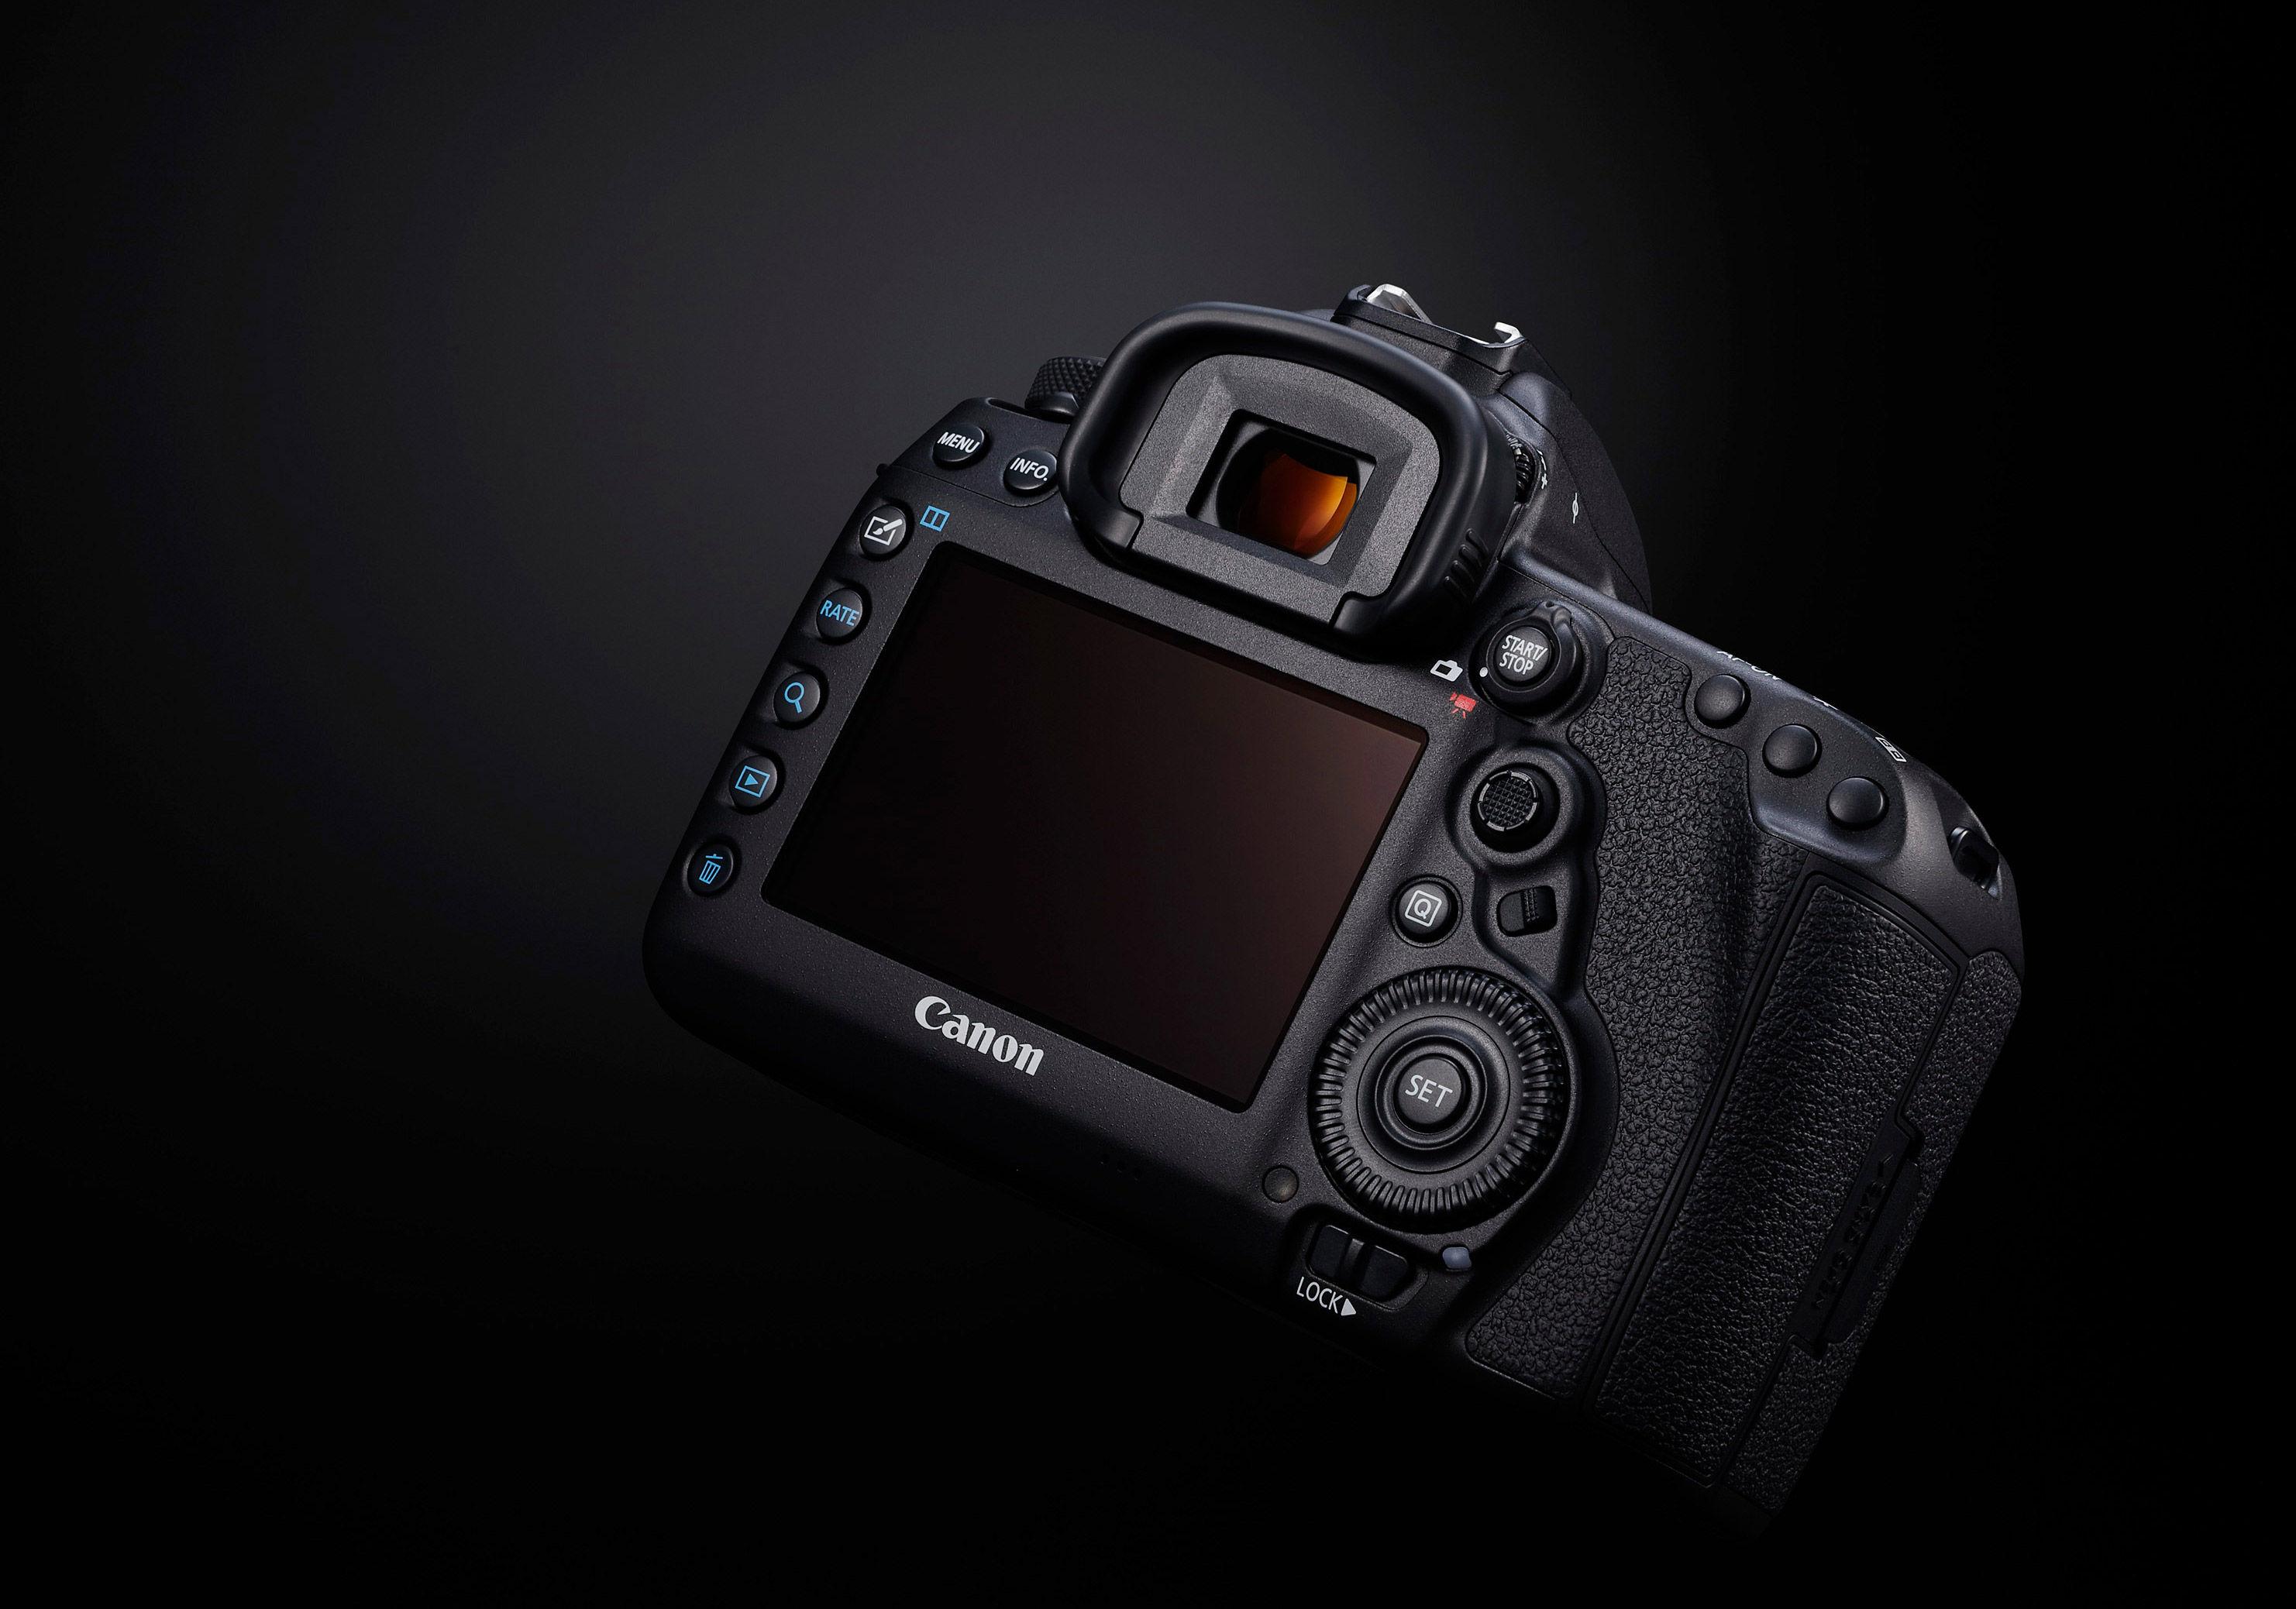 Canon Eos 5d Mark Iv Dslr Body With 470ex Ai Flash